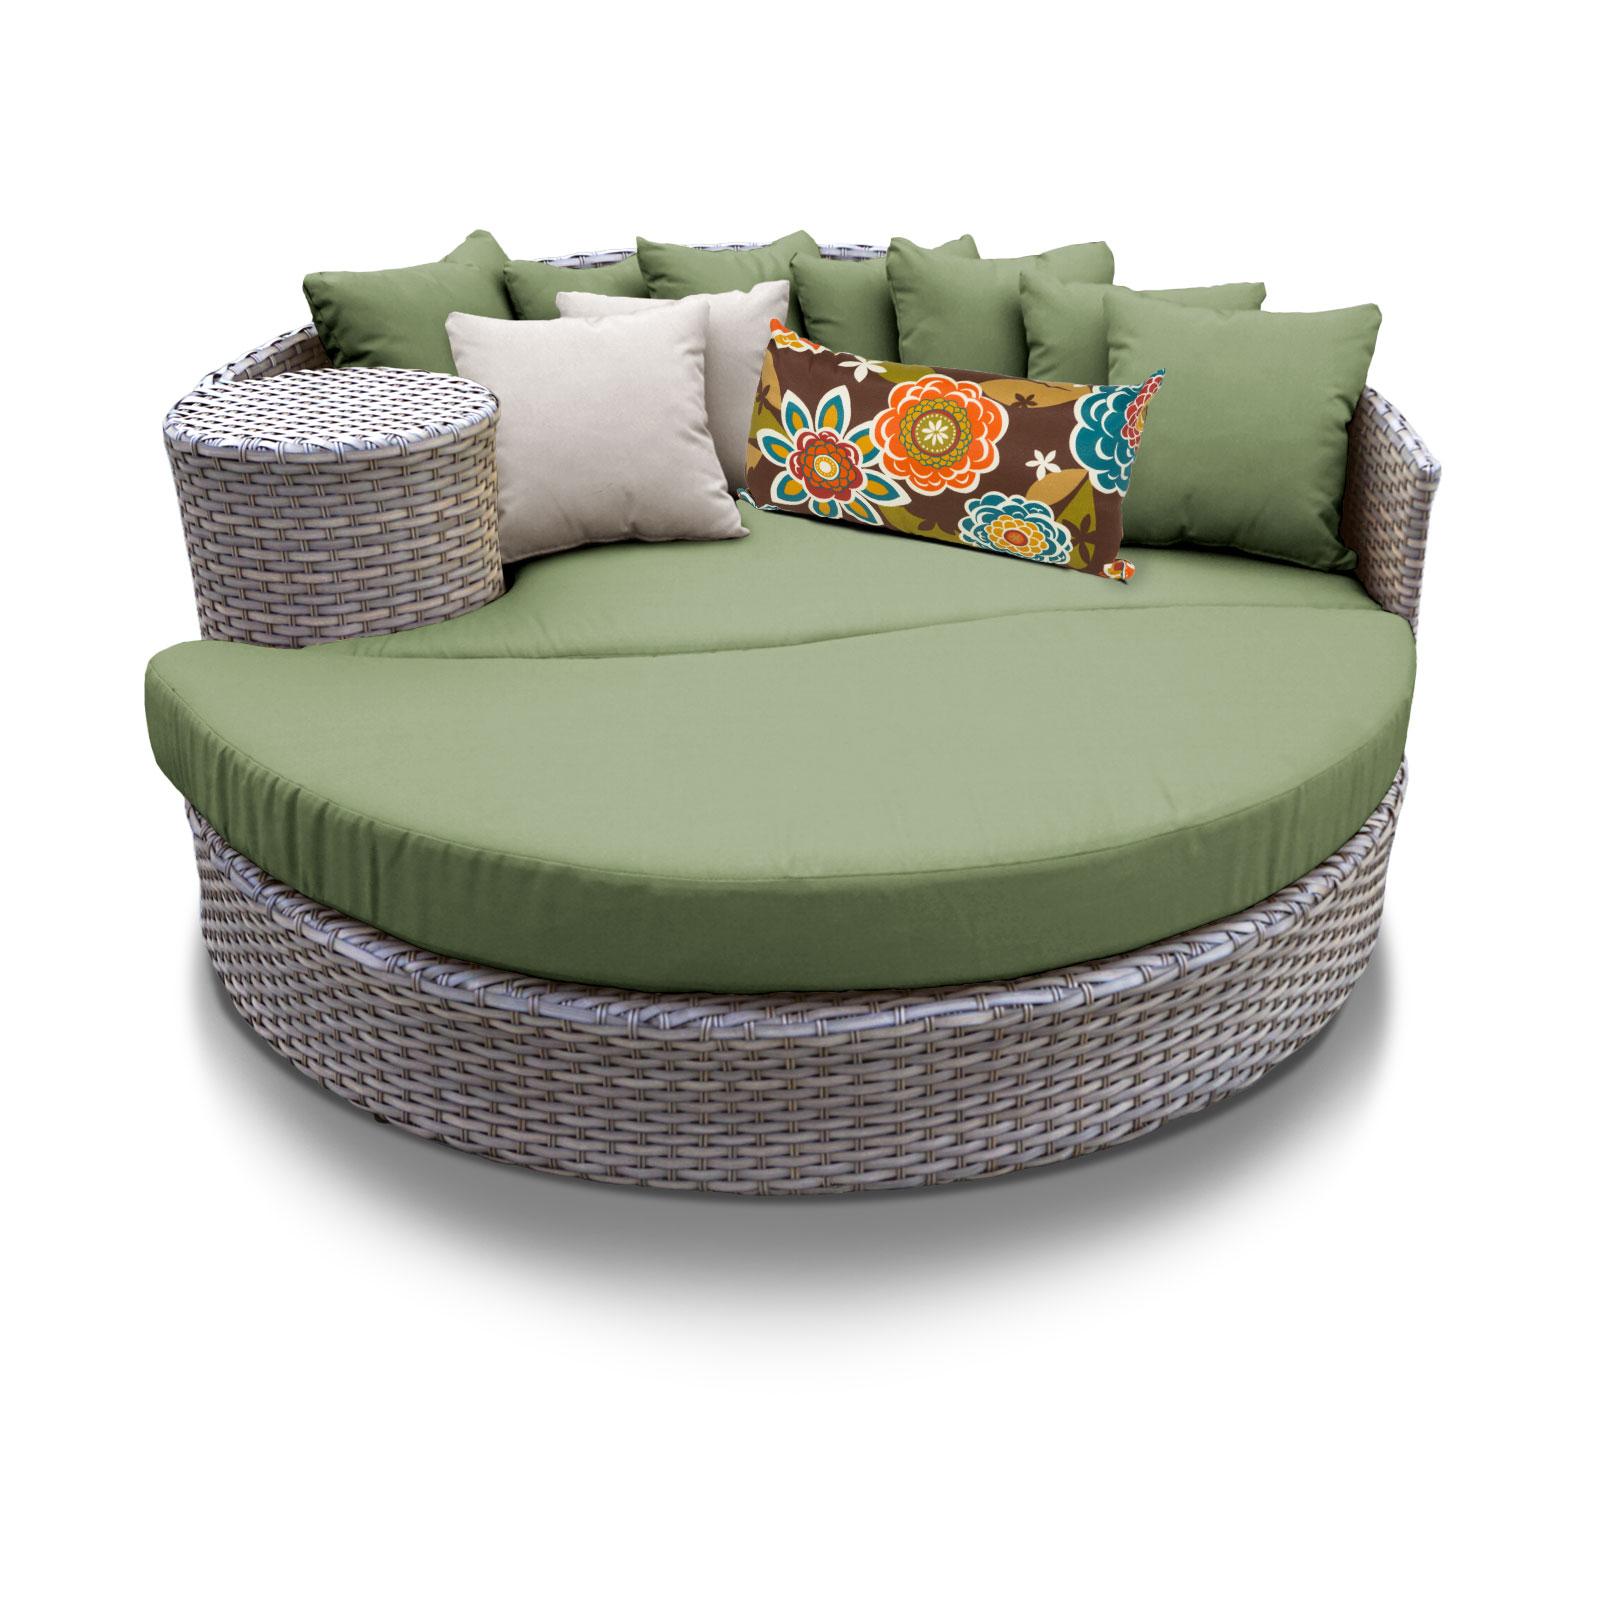 TK Classics Oasis Circular Sun Bed - Outdoor Wicker Patio...